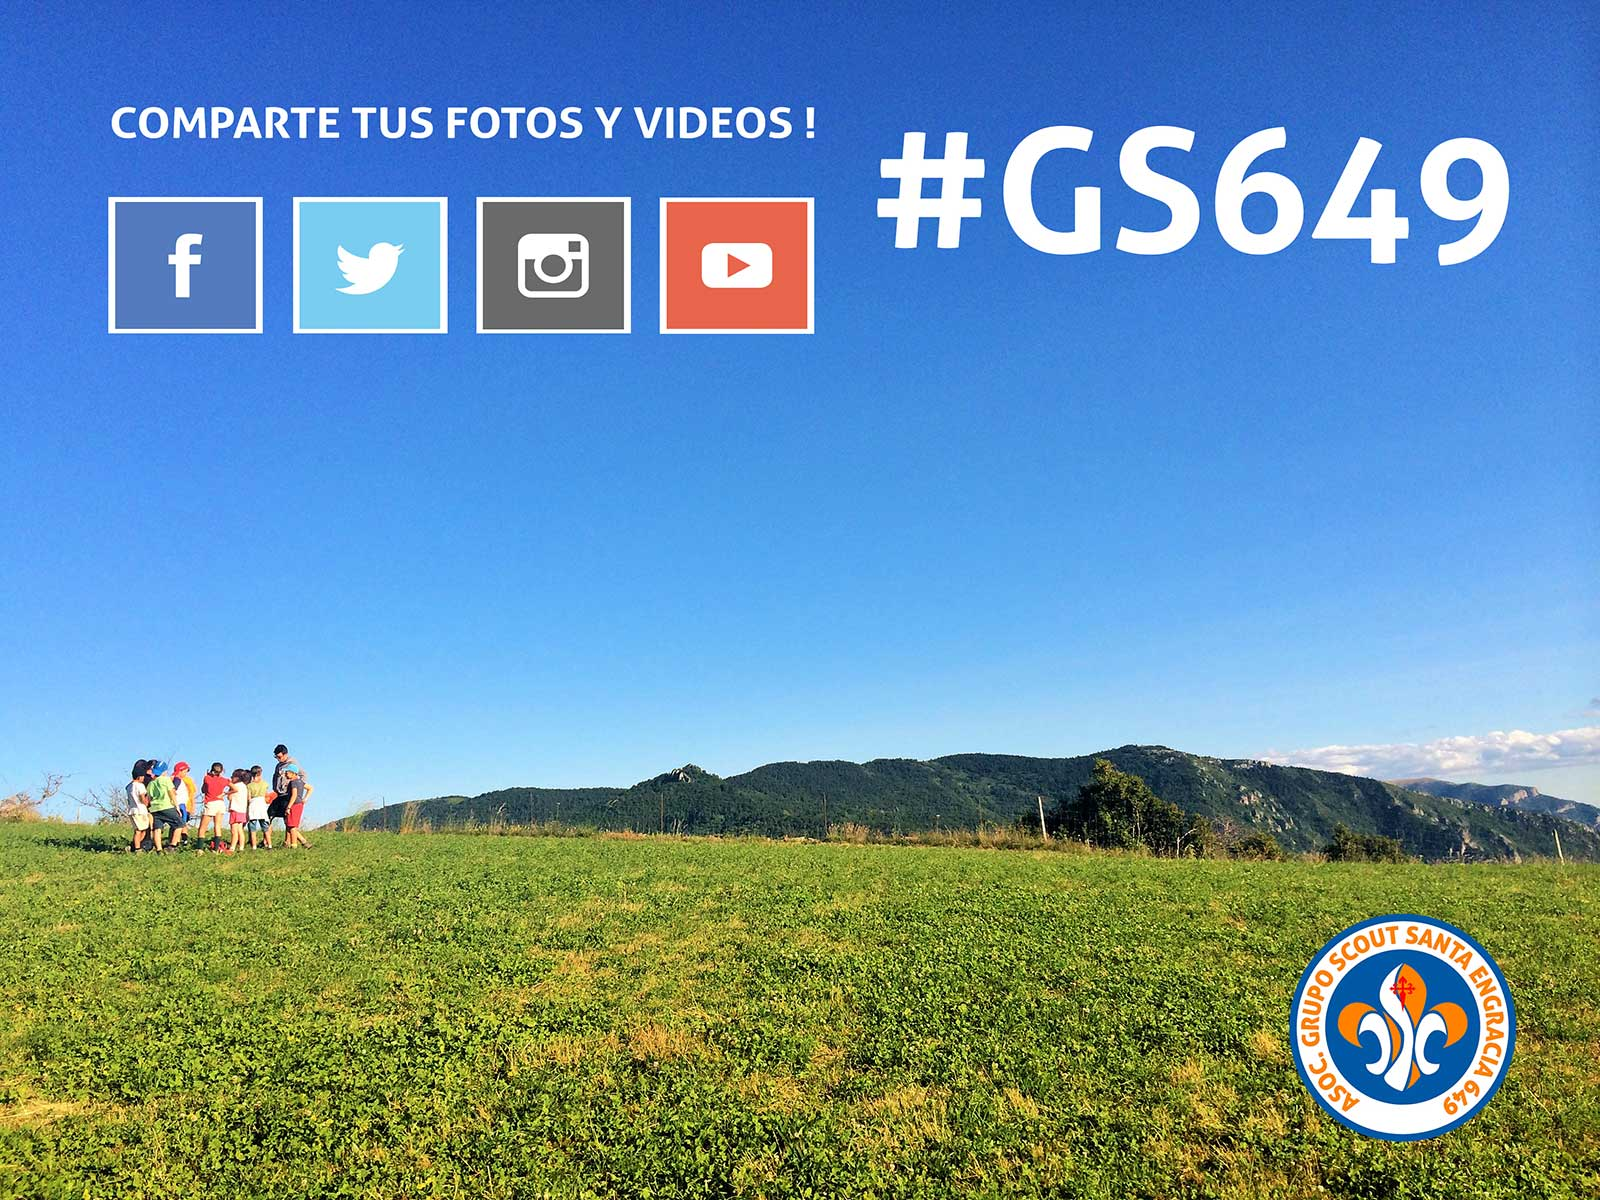 GS6492